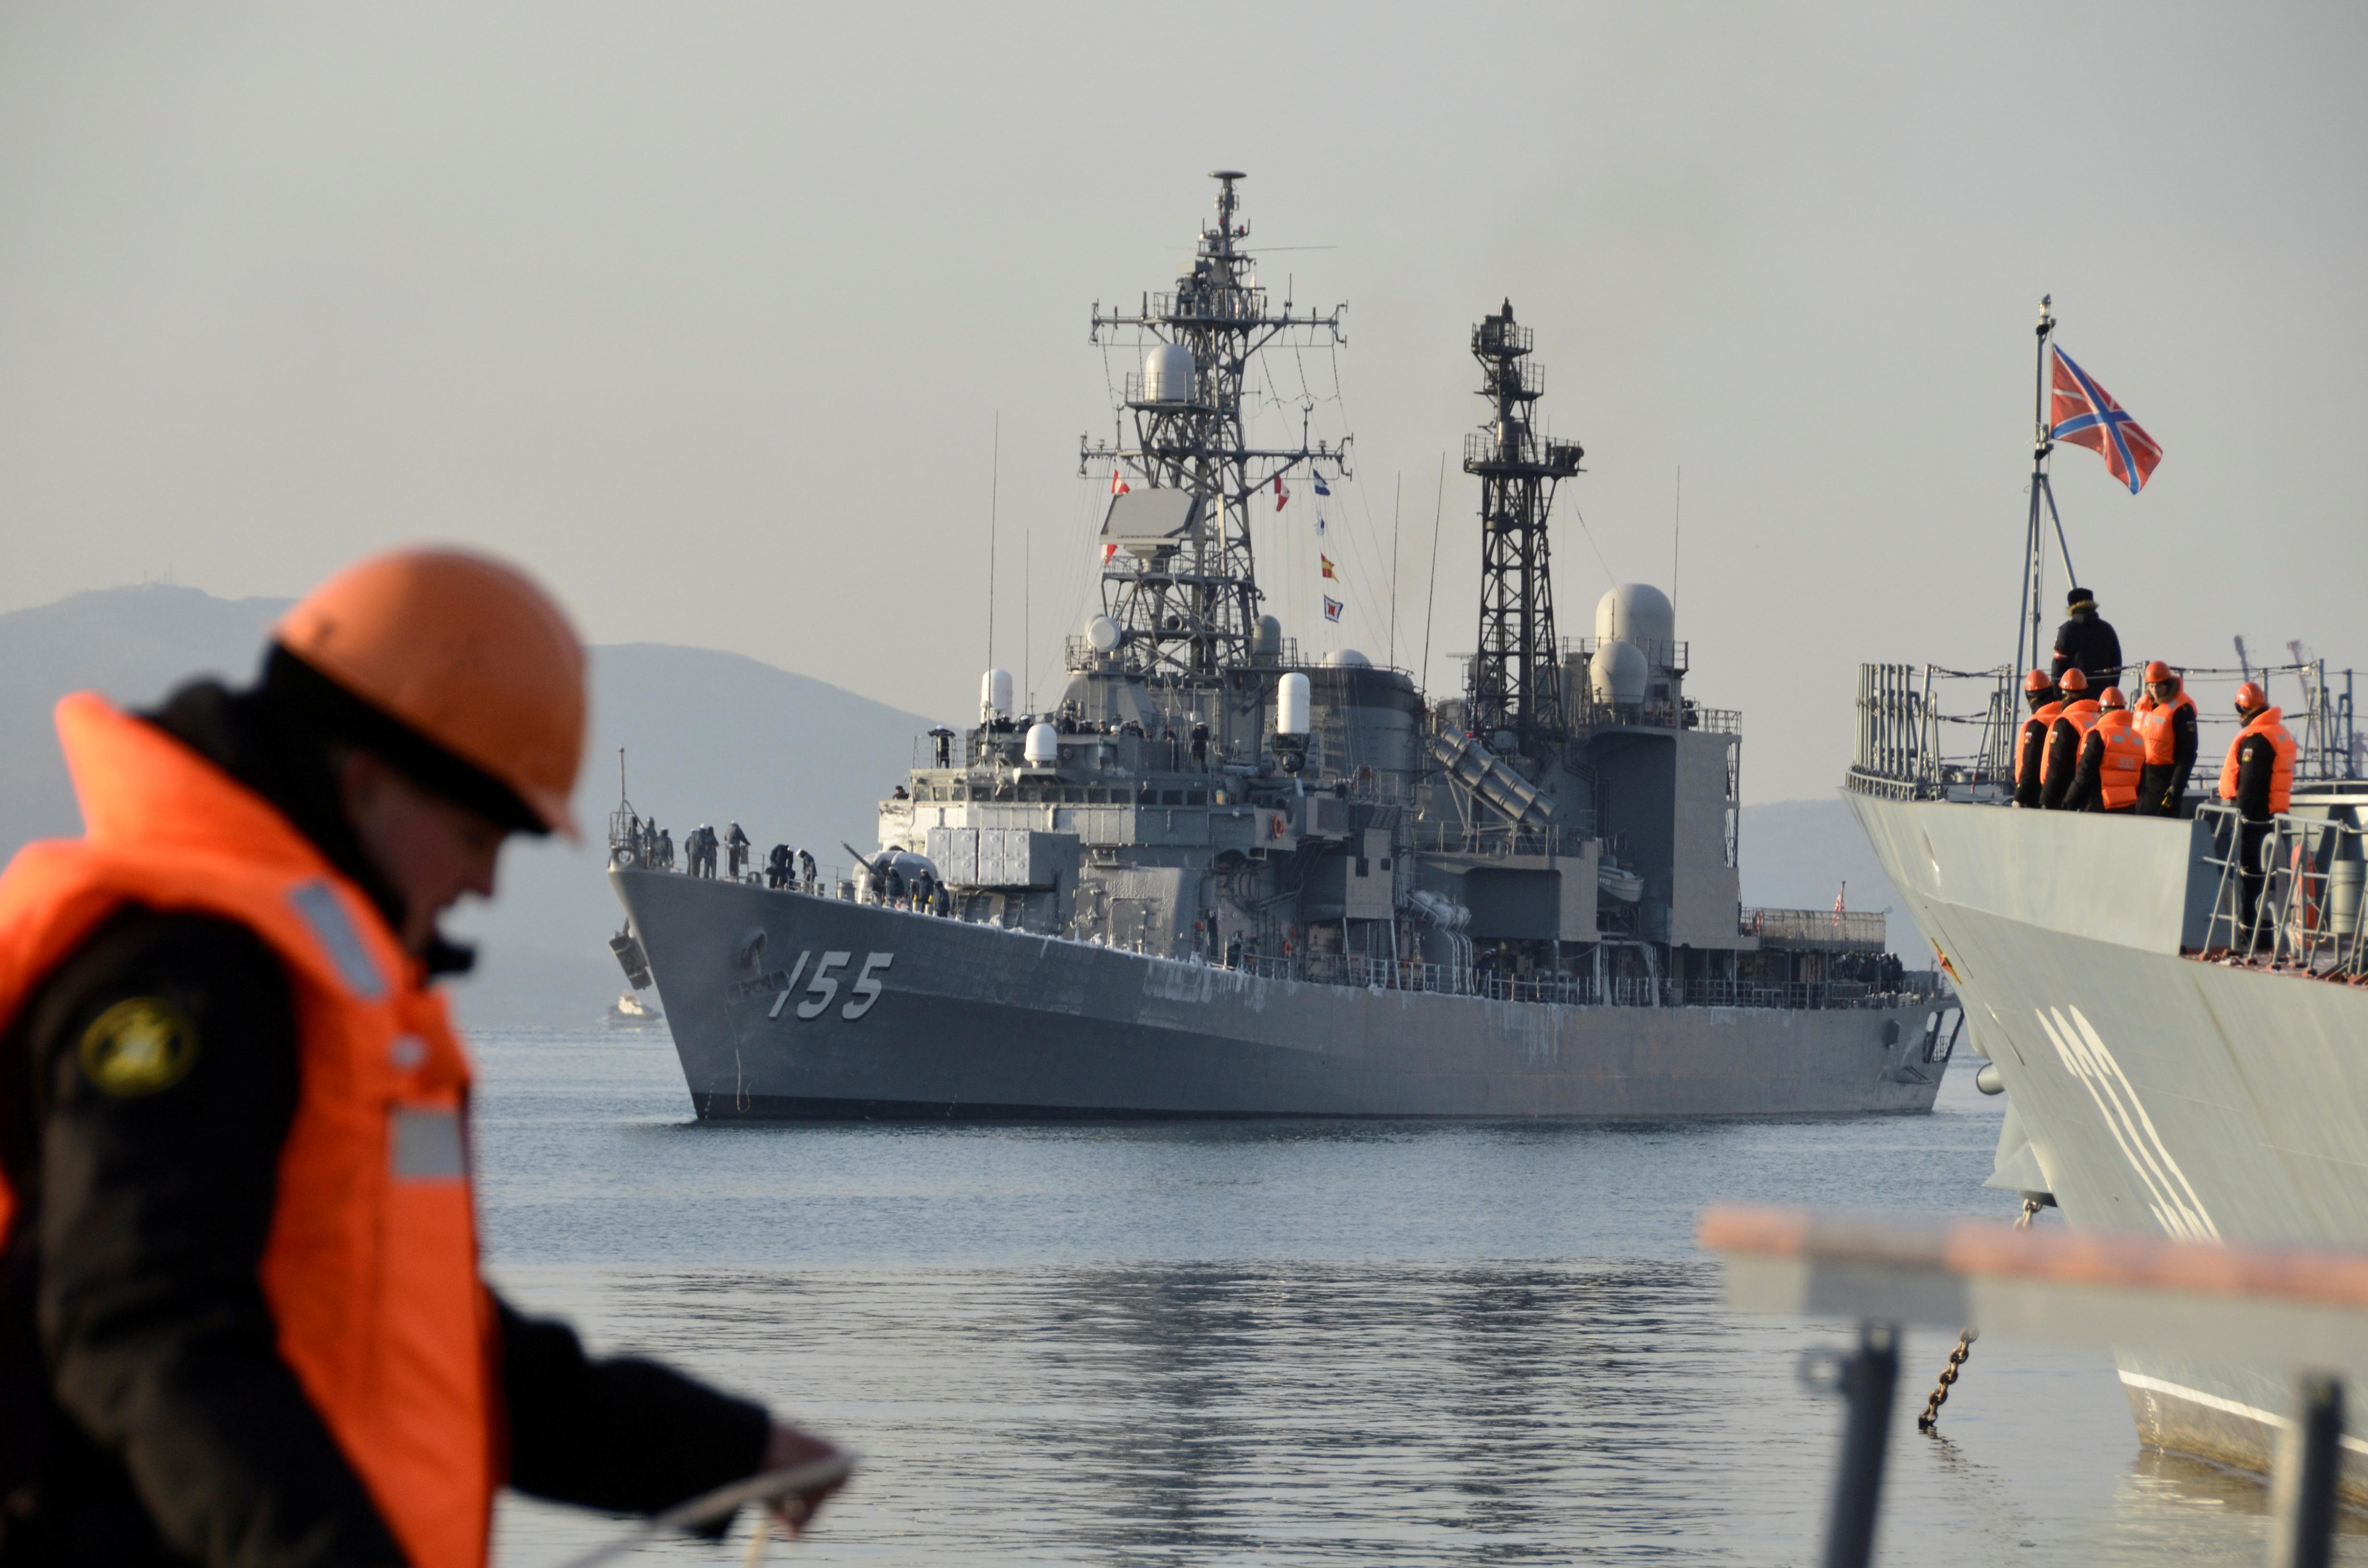 Japanese Maritime Self Defense Force's Asagiri-class destroyer Hamagiri arrives in the far eastern city of Vladivostok, Russia November 20, 2017. REUTERS/Yuri Maltsev/File Photo